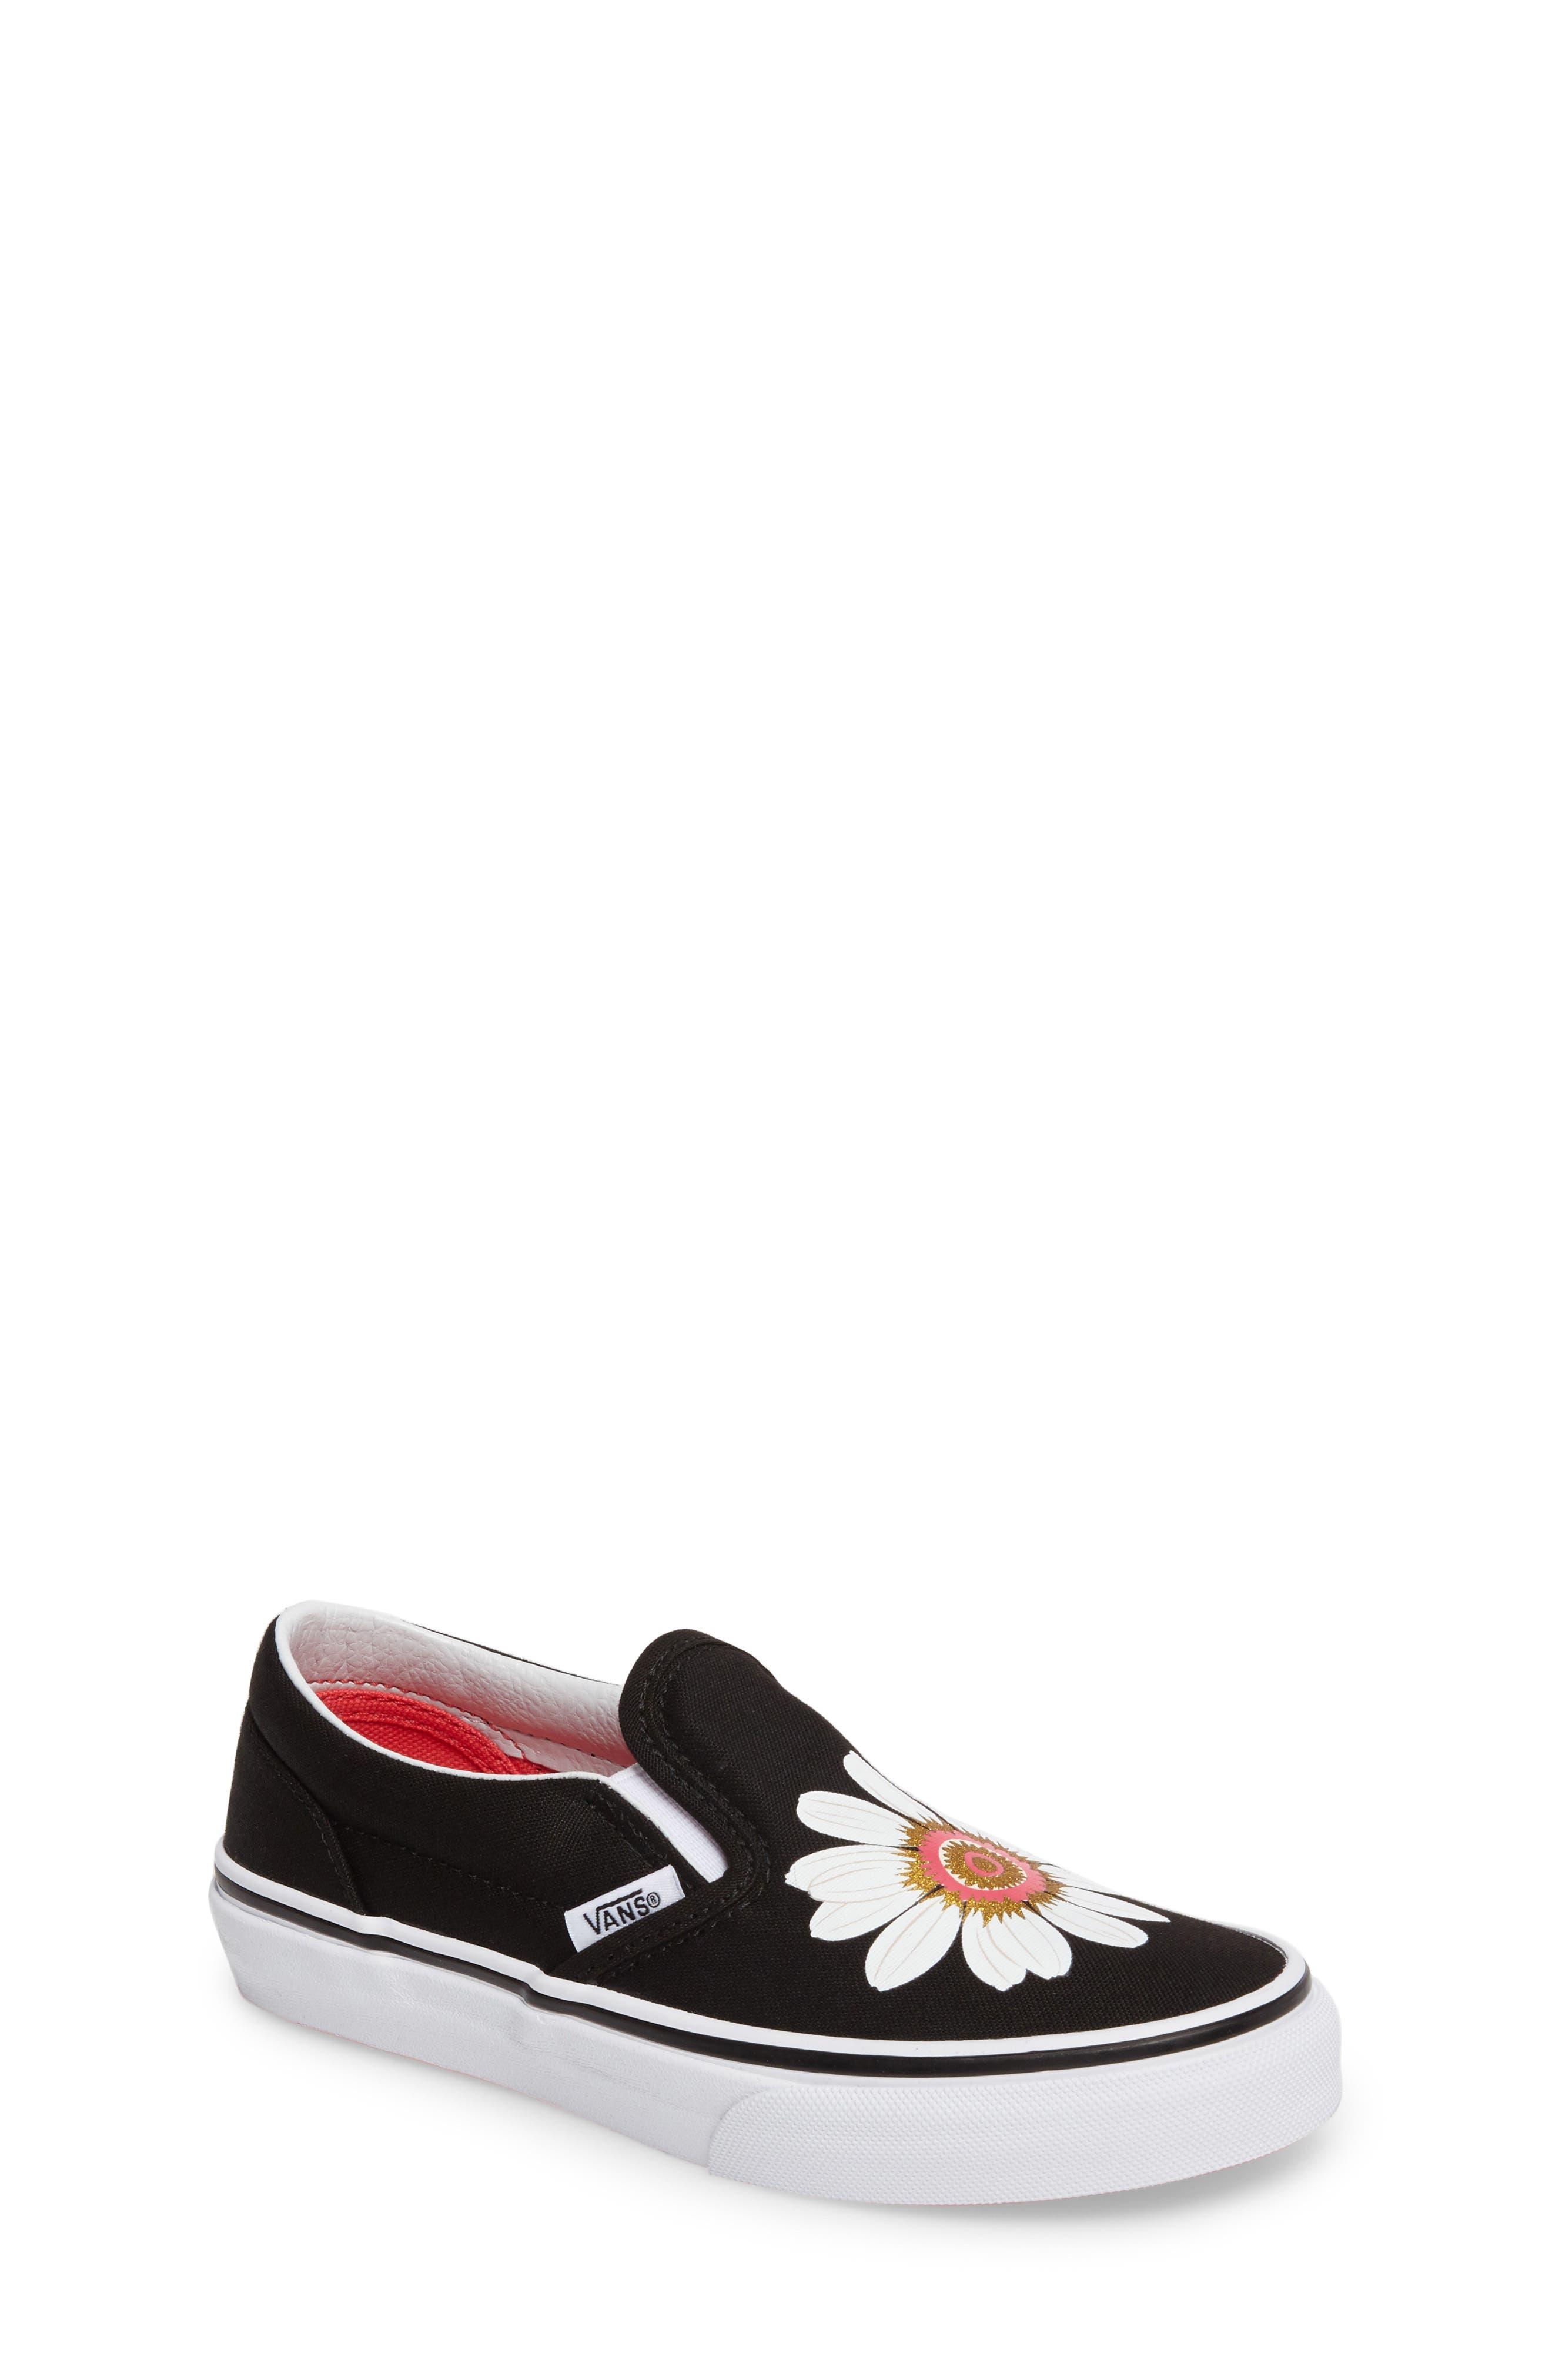 Main Image - Vans Classic Flower Slip-On Sneaker (Baby, Walker, Toddler, Little Kid & Big Kid)